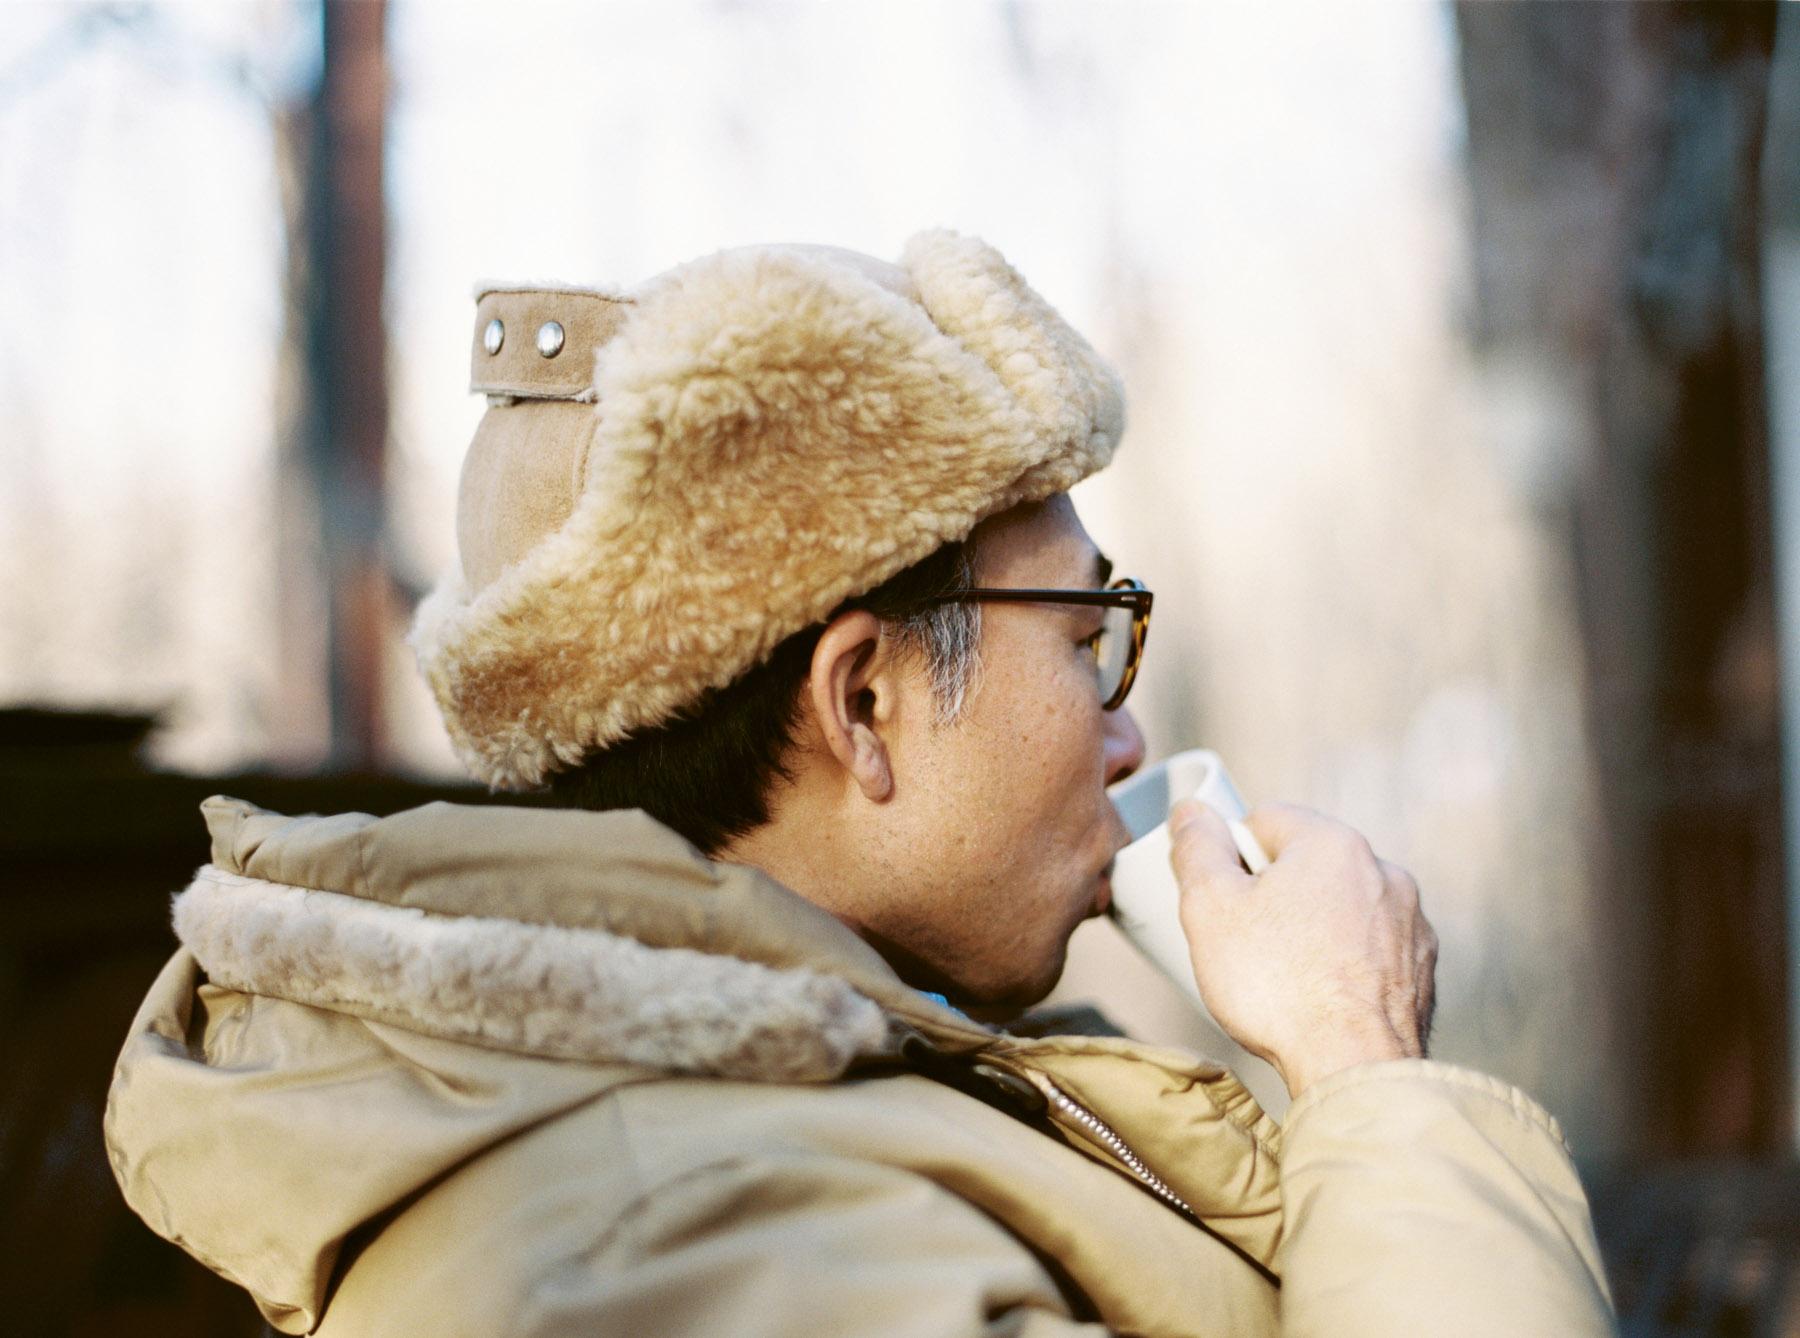 Shoichiro Aiba, Life Son, Justin Chung, Kodak, Japan